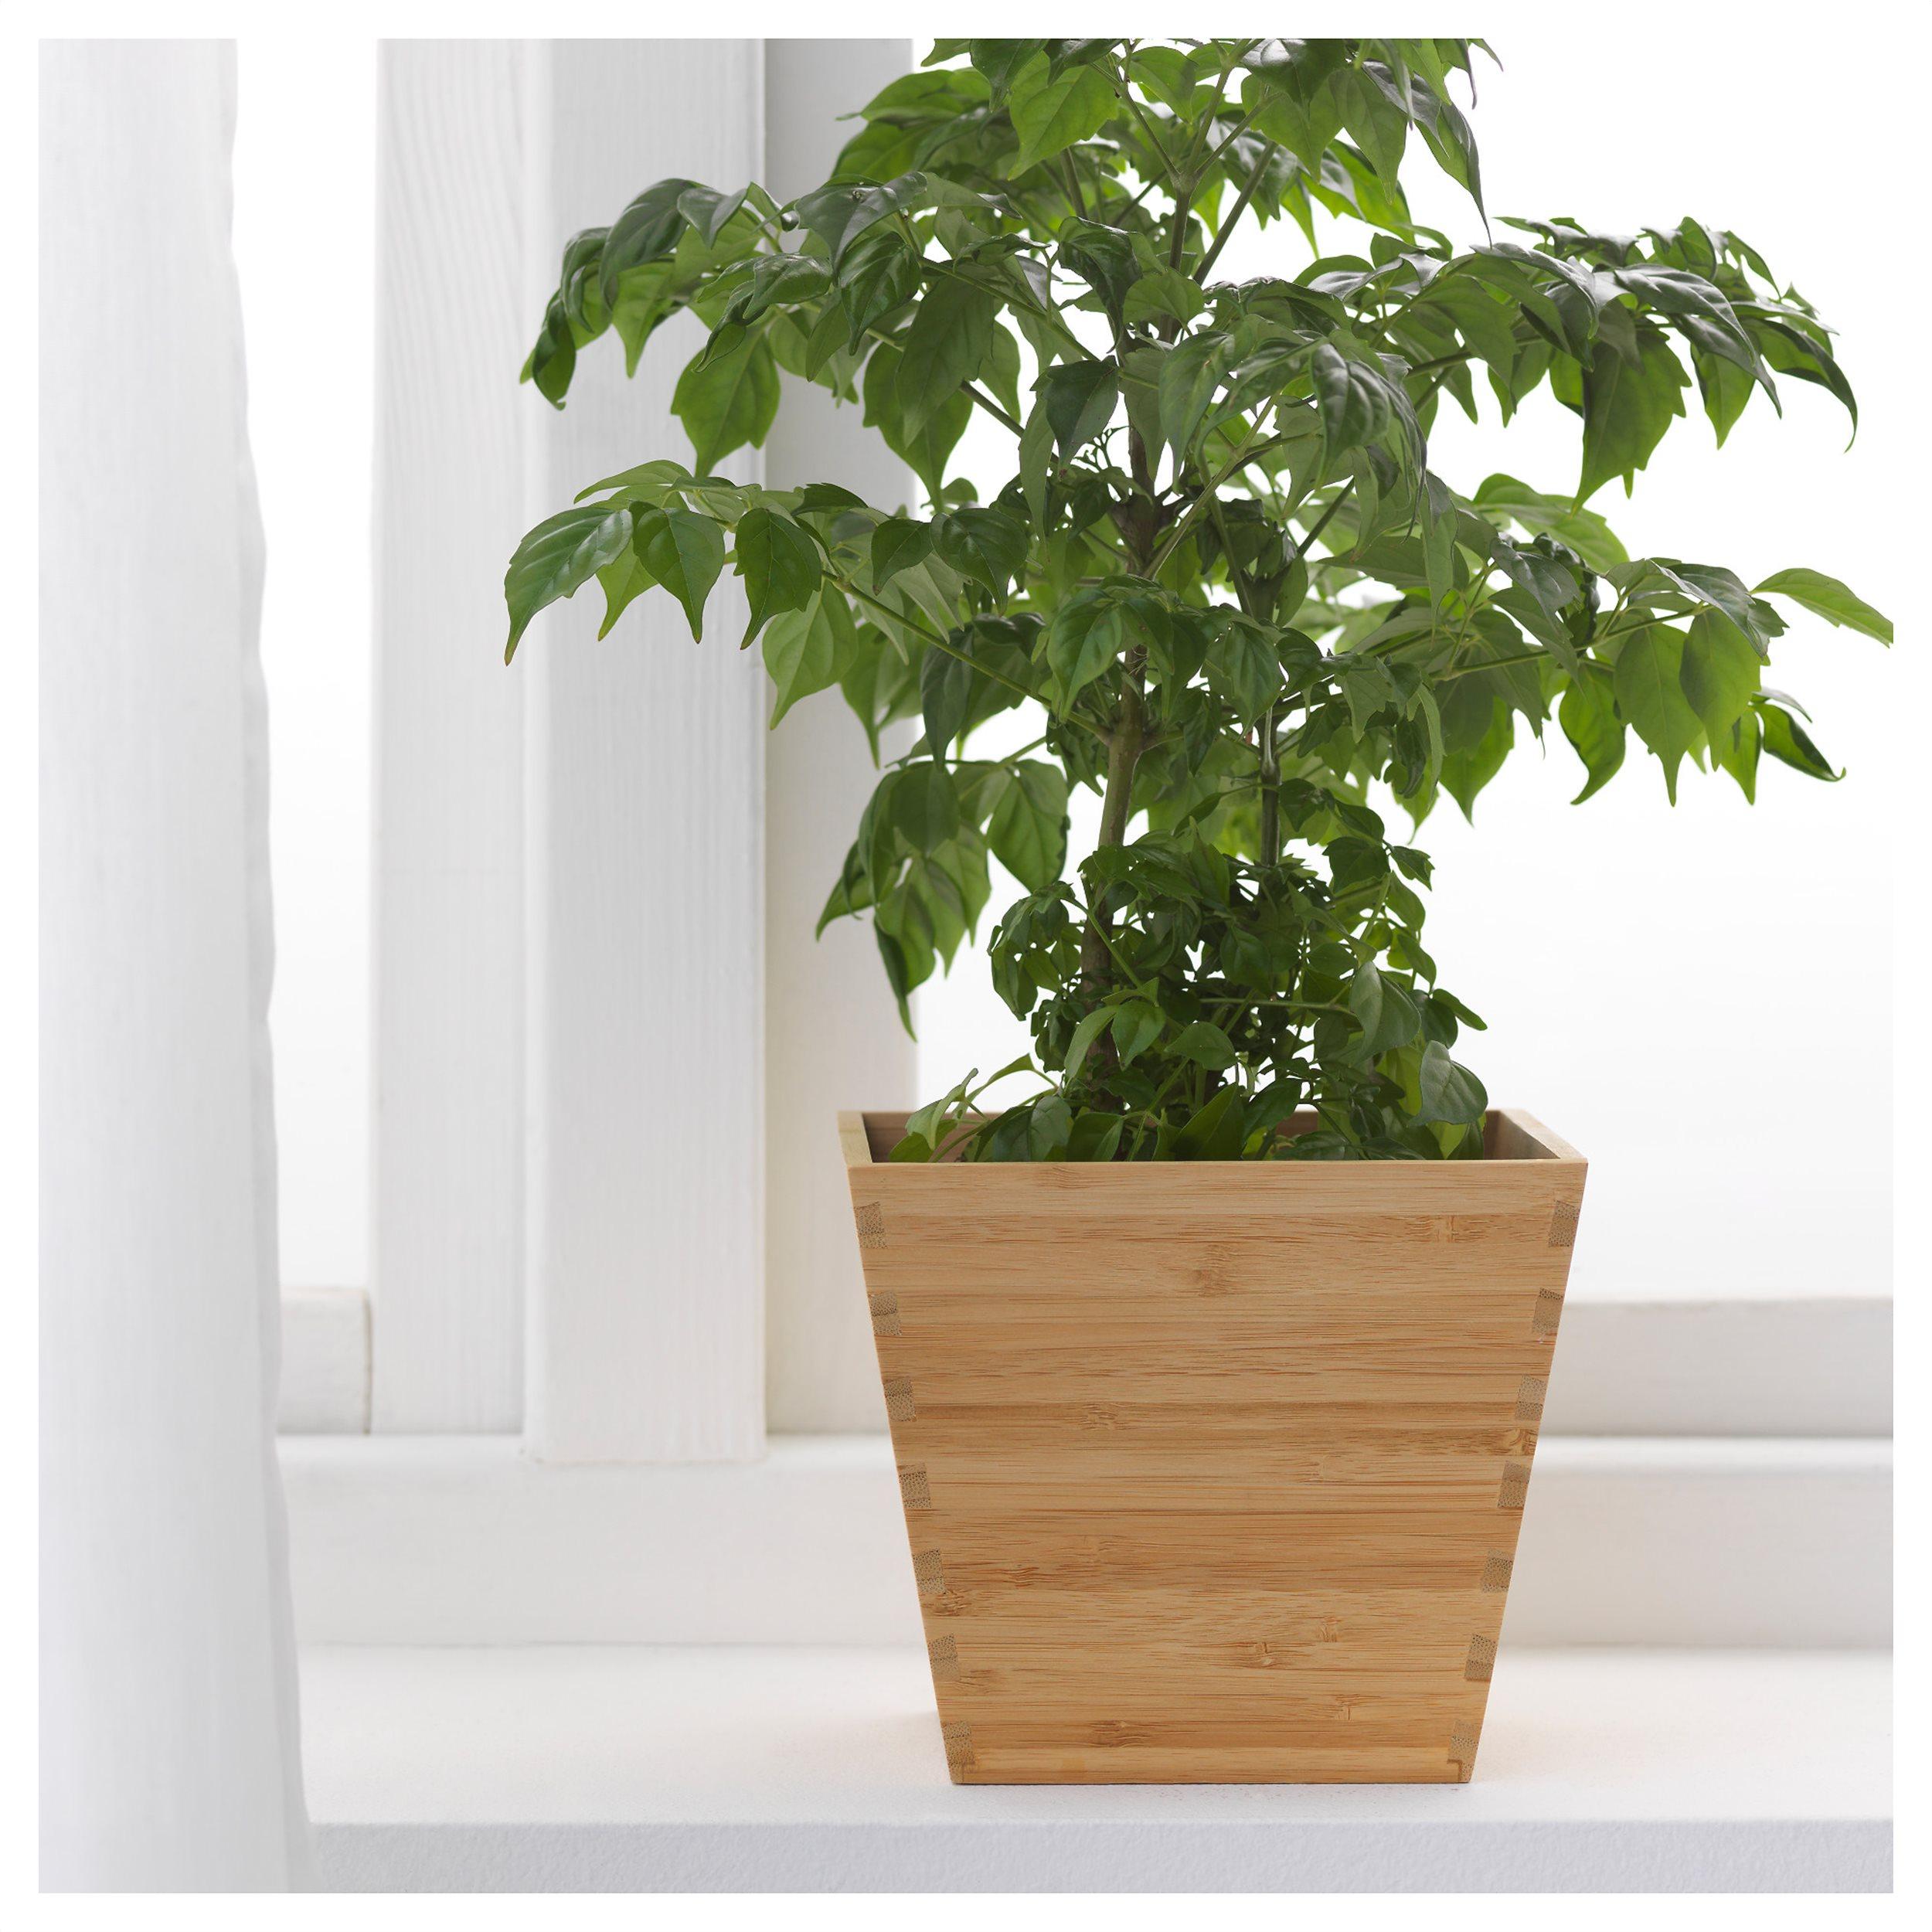 Laser Cut Wooden Plant Pot Flower Holder Free Vector